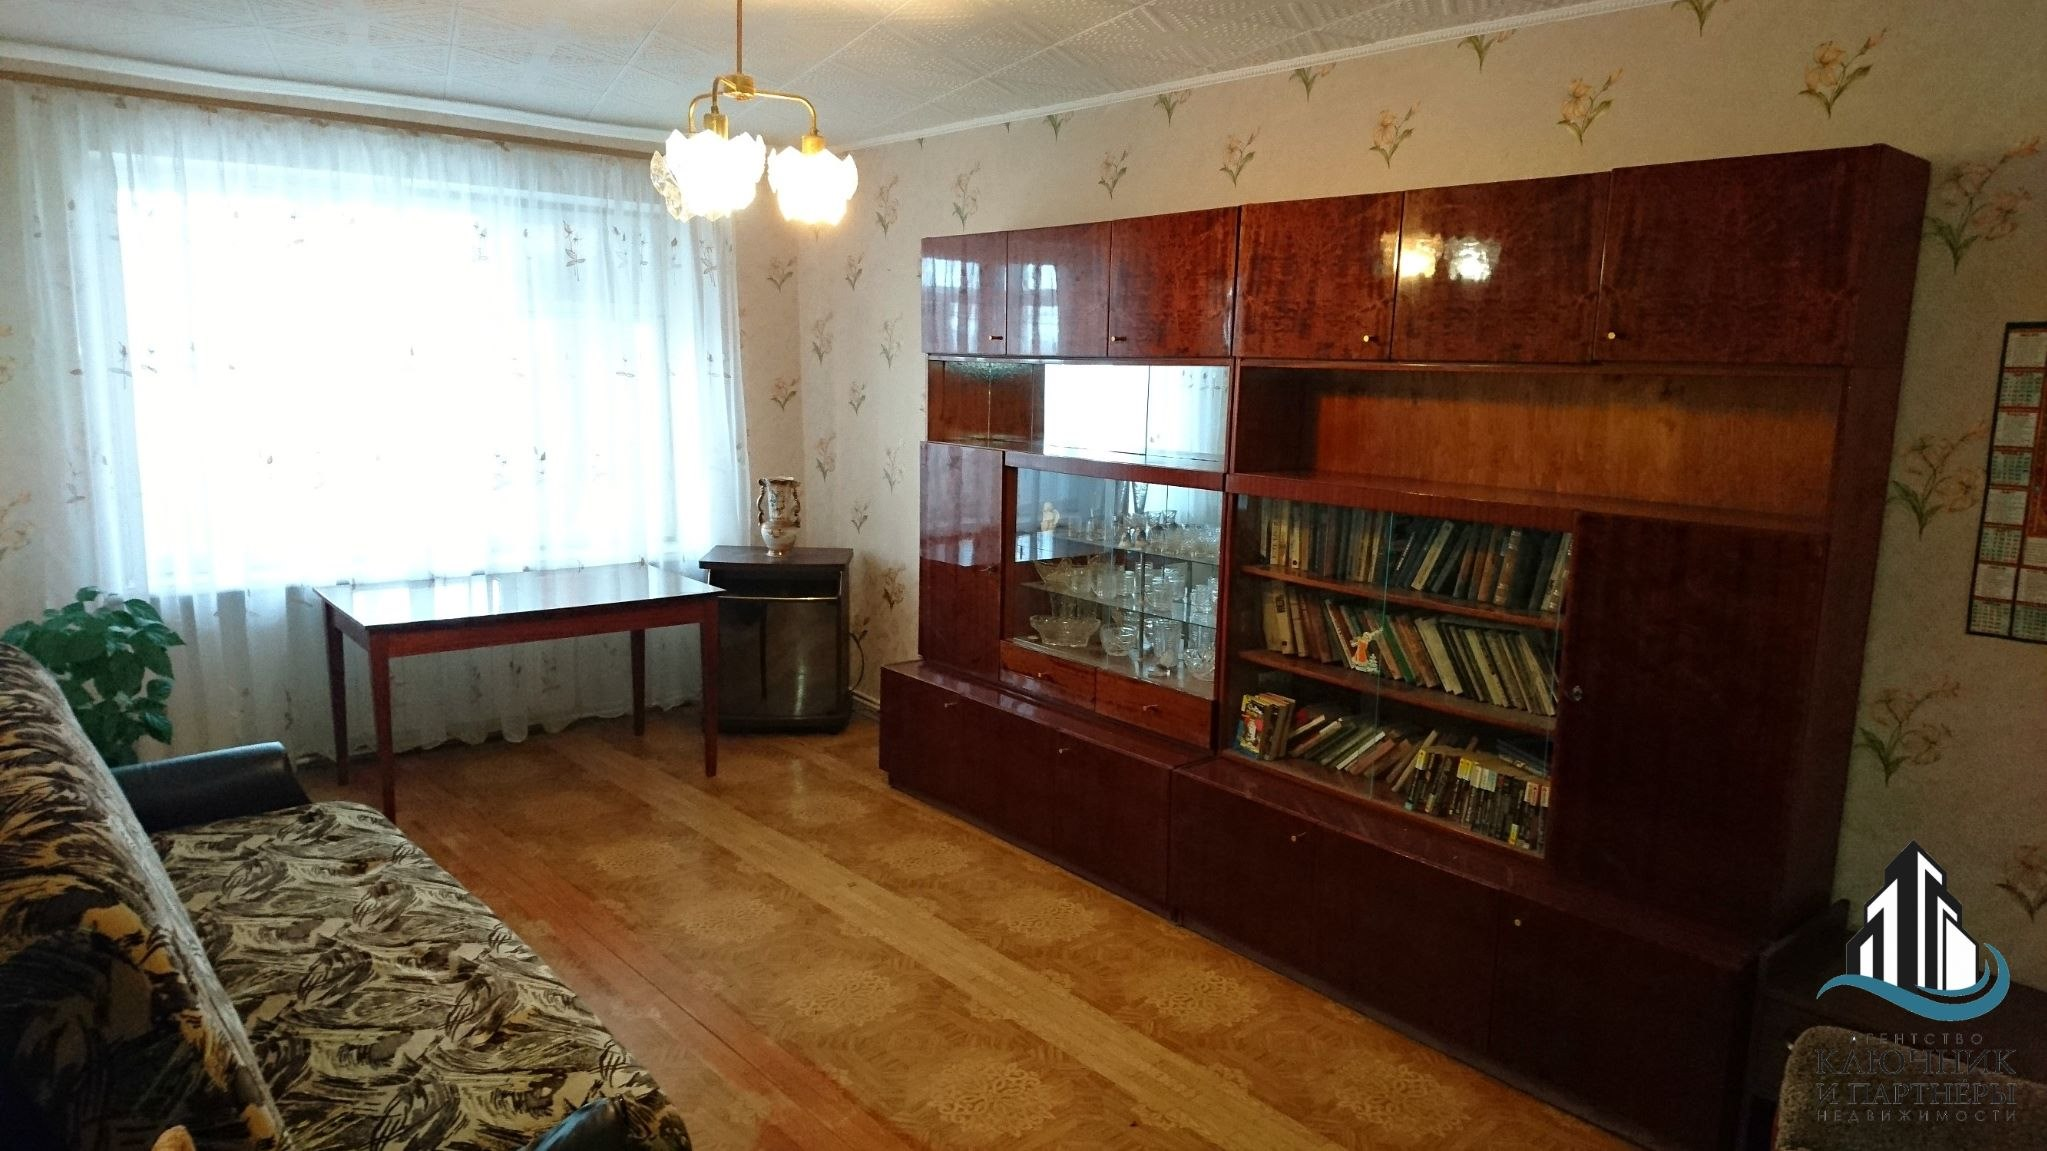 Продажа квартир: 3-комнатная квартира, республика Крым, Феодосия, пгт. Приморский, Керченская ул., 56, фото 1